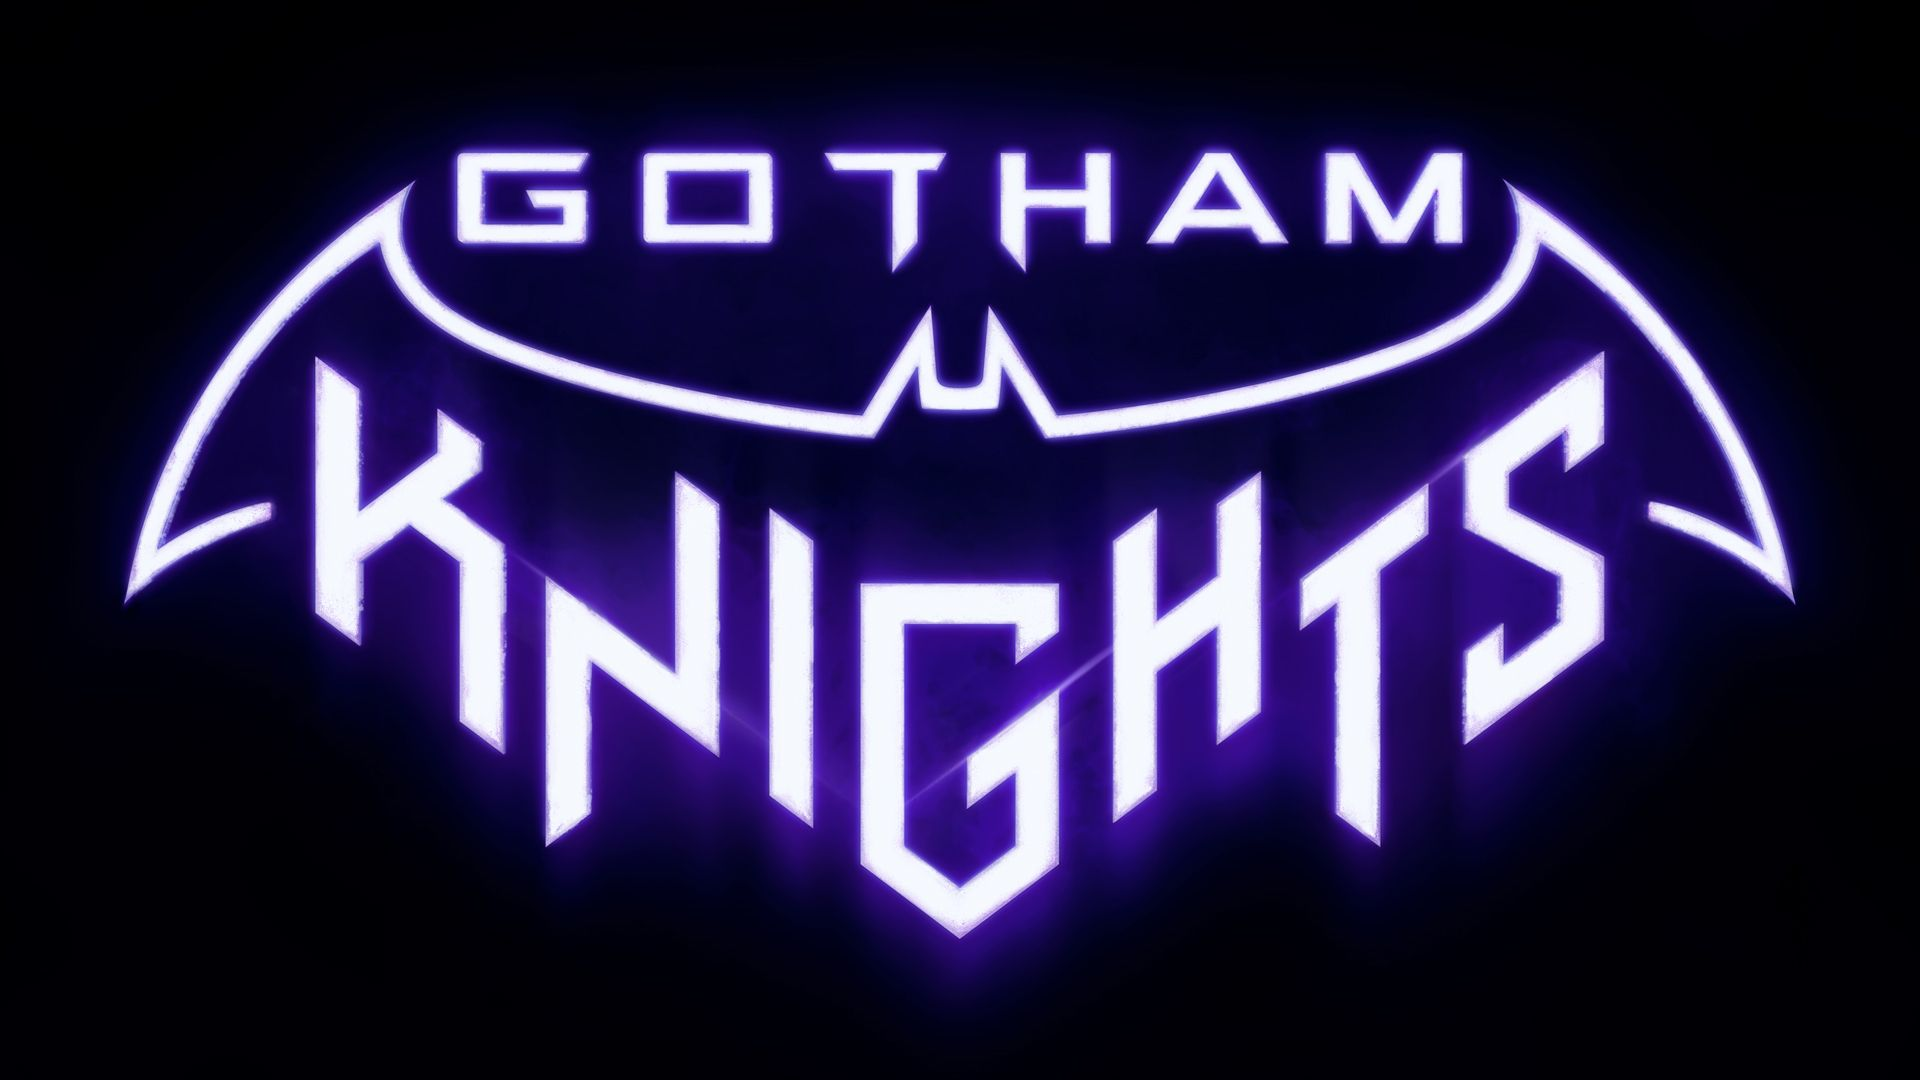 wp7248443-batman-gotham-knights-game-wallpapers (1)